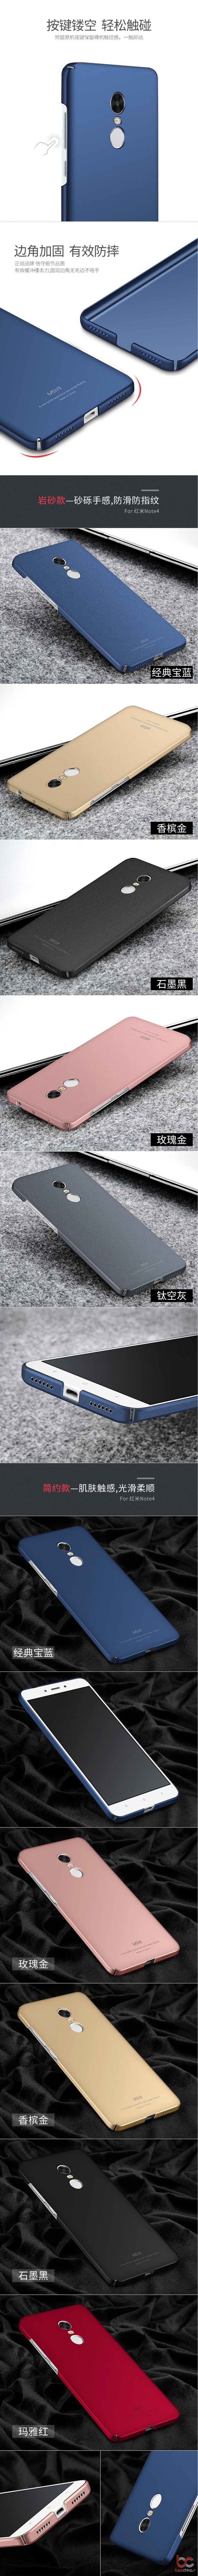 xiaomi-redmi-note-4msvii-back-cover-3